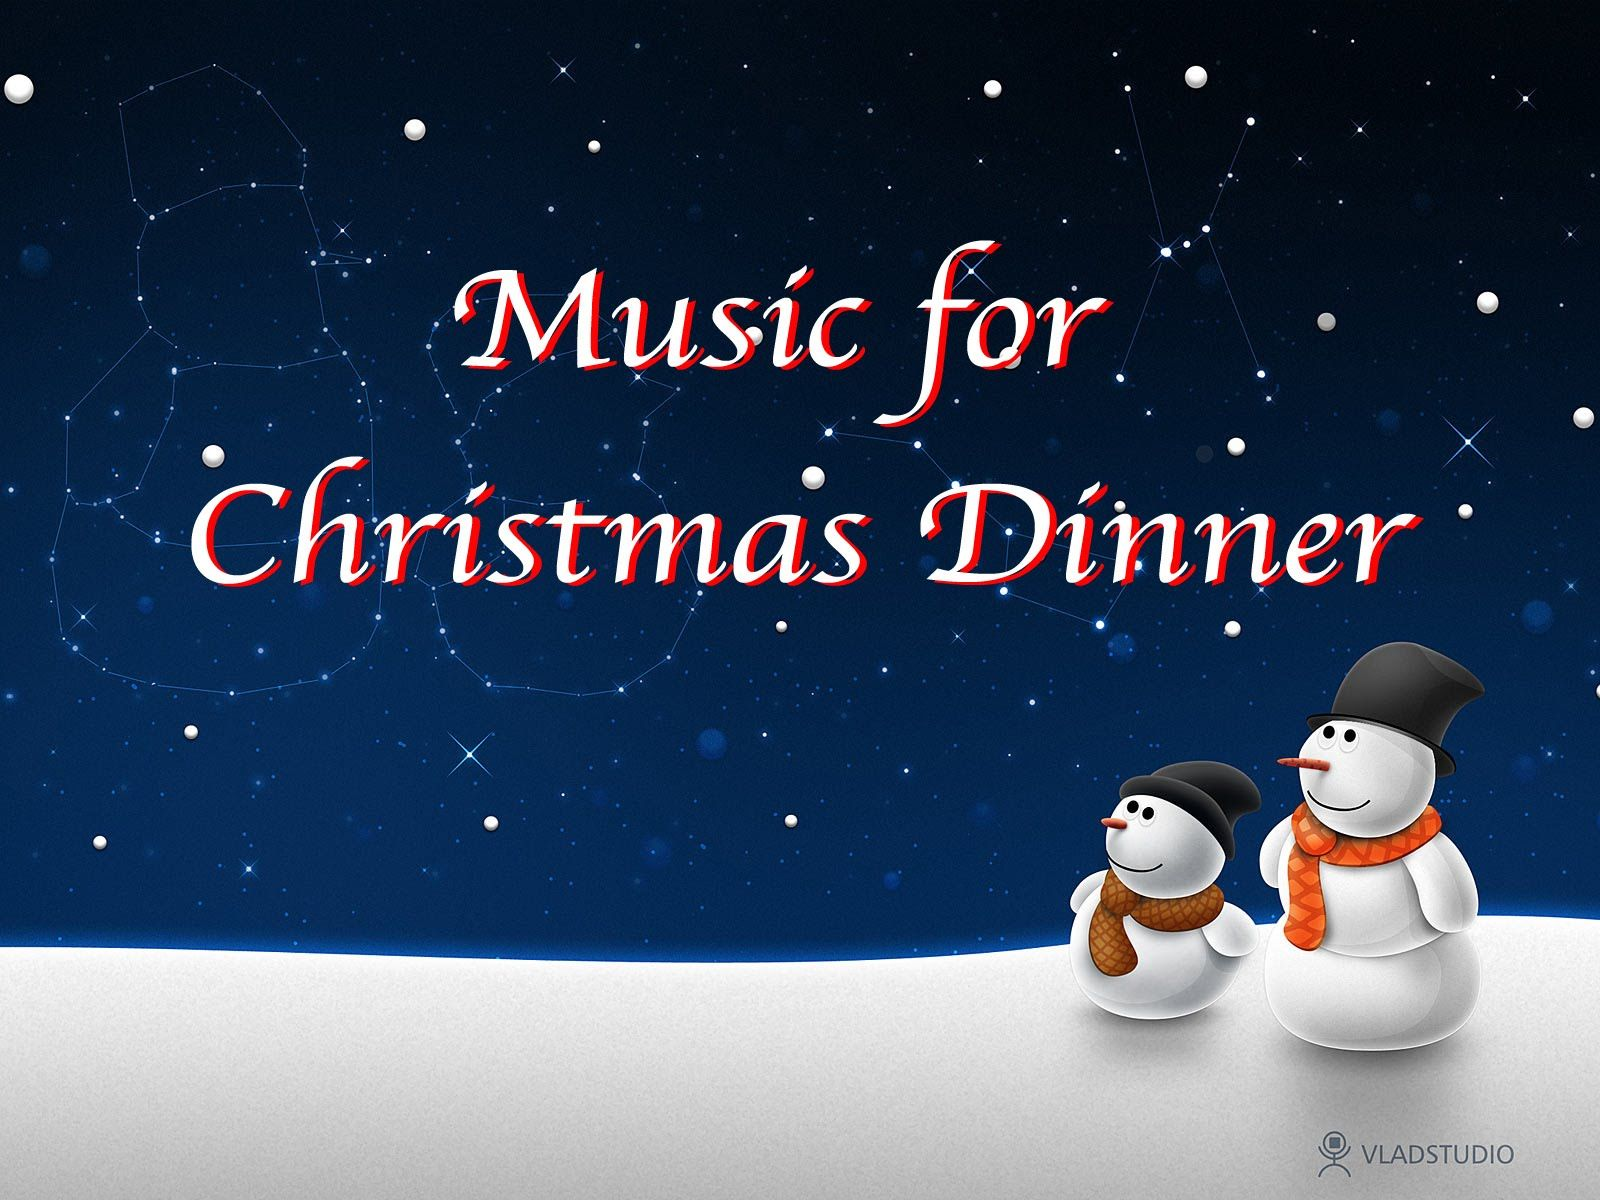 Music for christmas dinner one hour of peaceful soft instrumental music for christmas dinner one hour of peaceful soft instrumental musi m4hsunfo